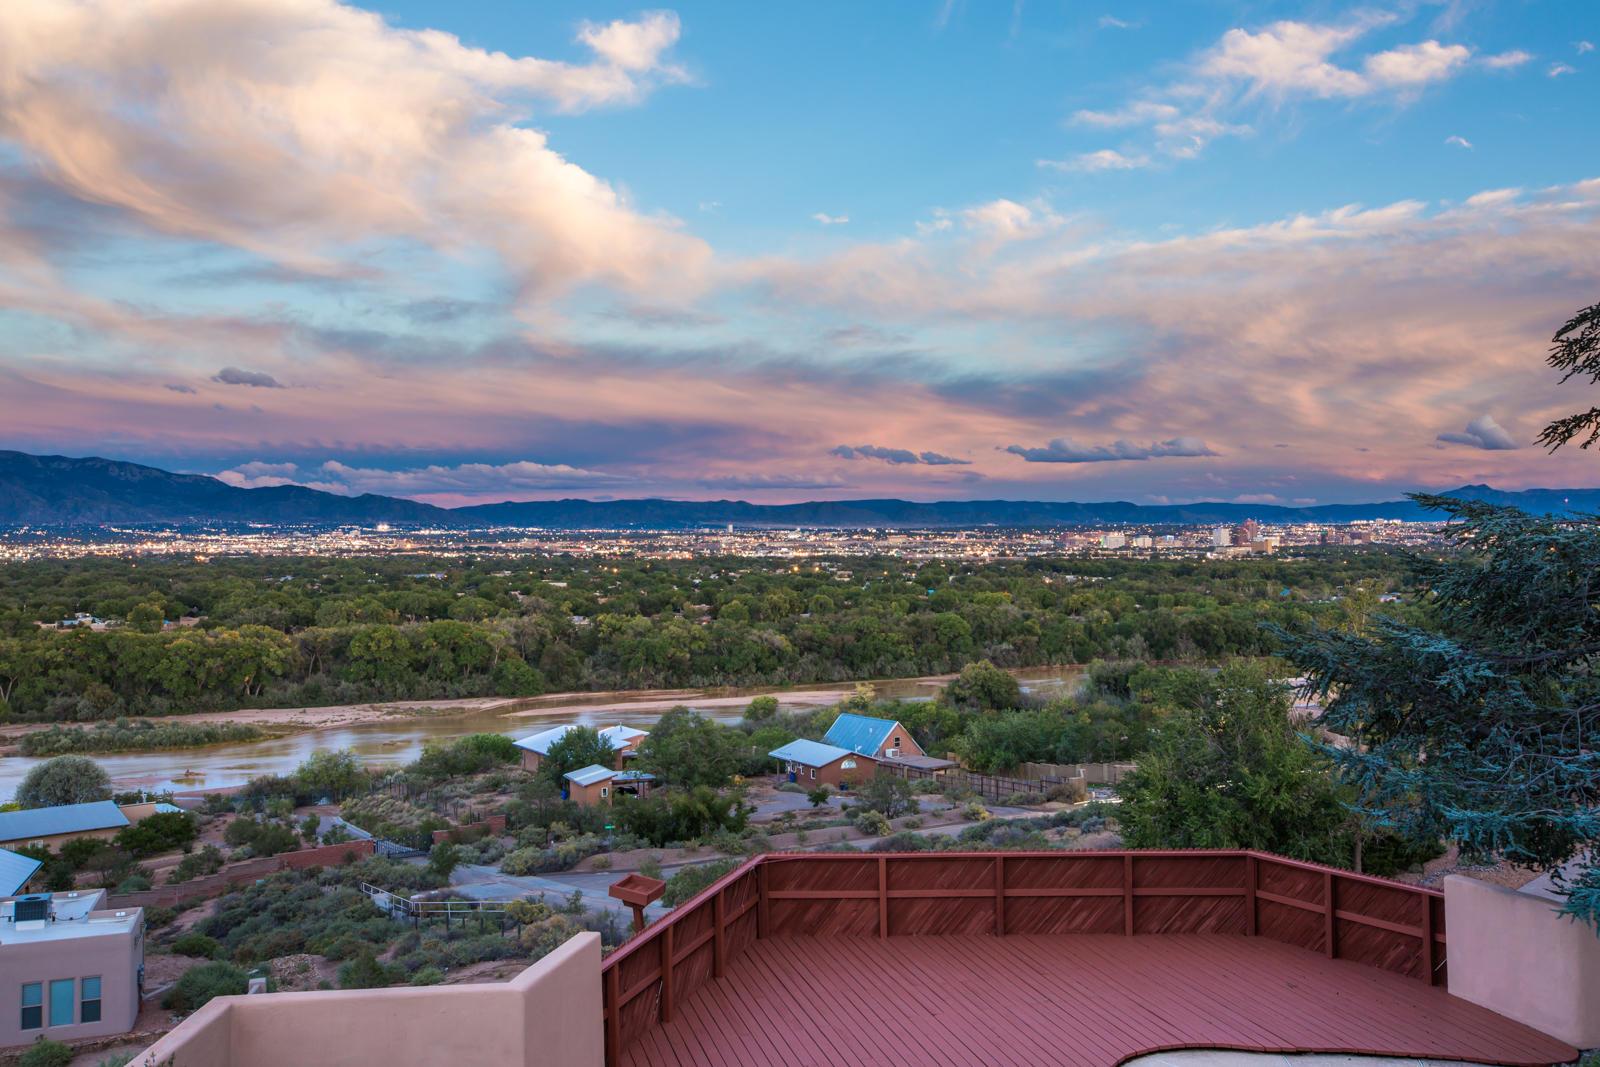 3600 NW Vista Grande Drive, Northwest Albuquerque and Northwest Heights, New Mexico